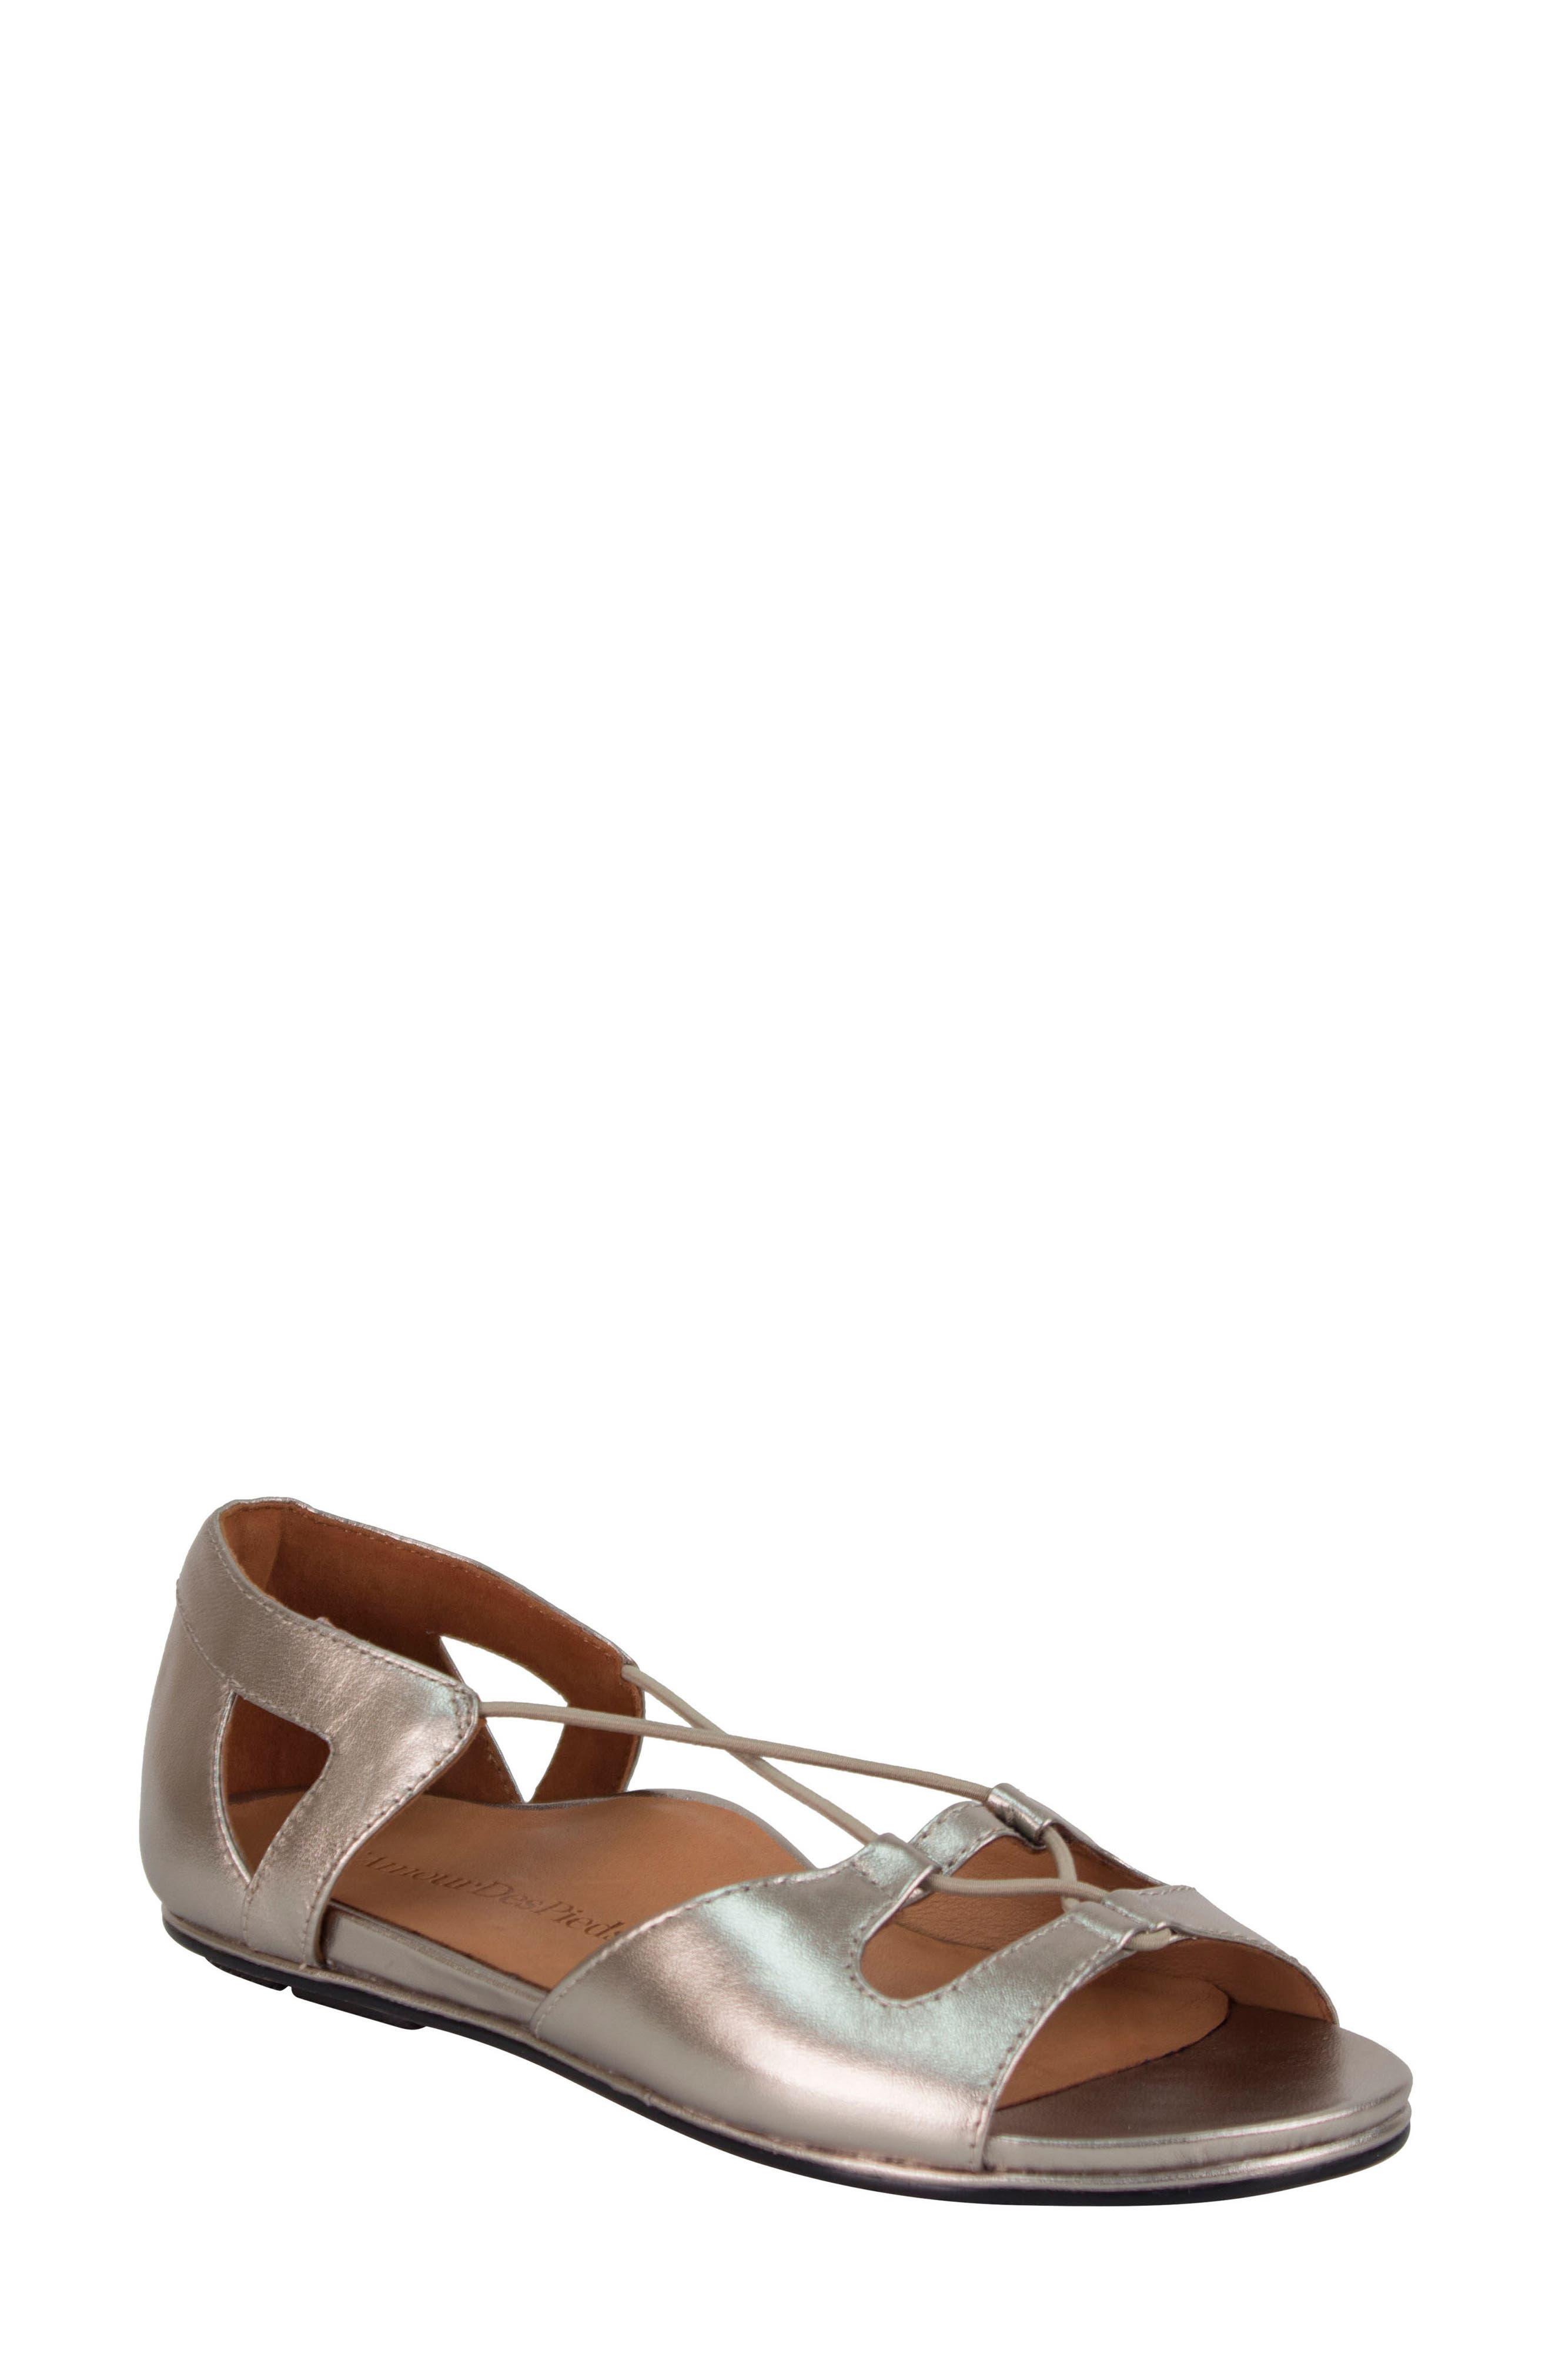 'Darron' Sandal,                         Main,                         color, Pewter Leather